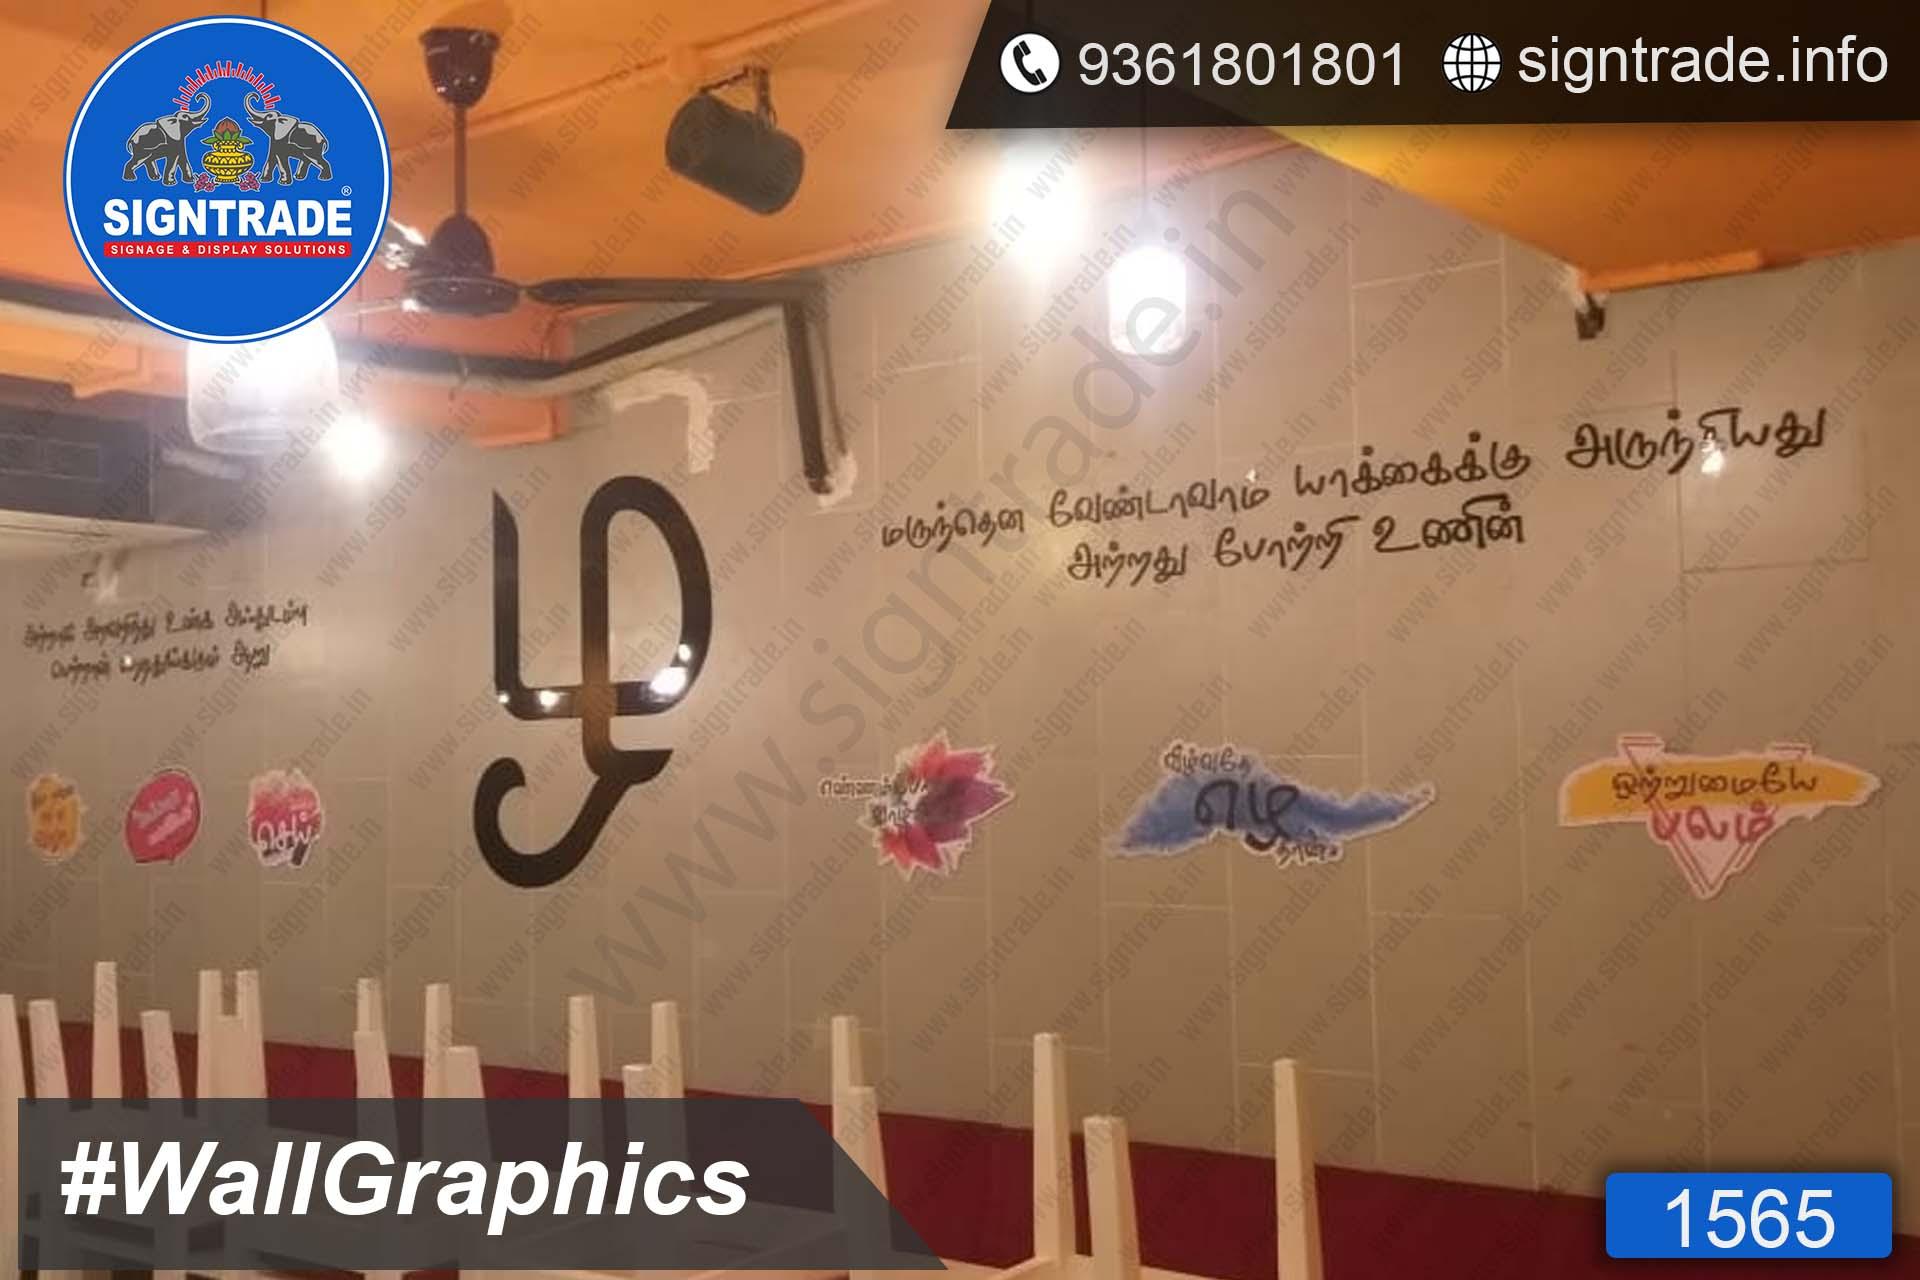 Aruvi Restaurant, Chennai - SIGNTRADE - Wall Graphics, Vinyl Graphics, Vinyl Printing Service in Chennai